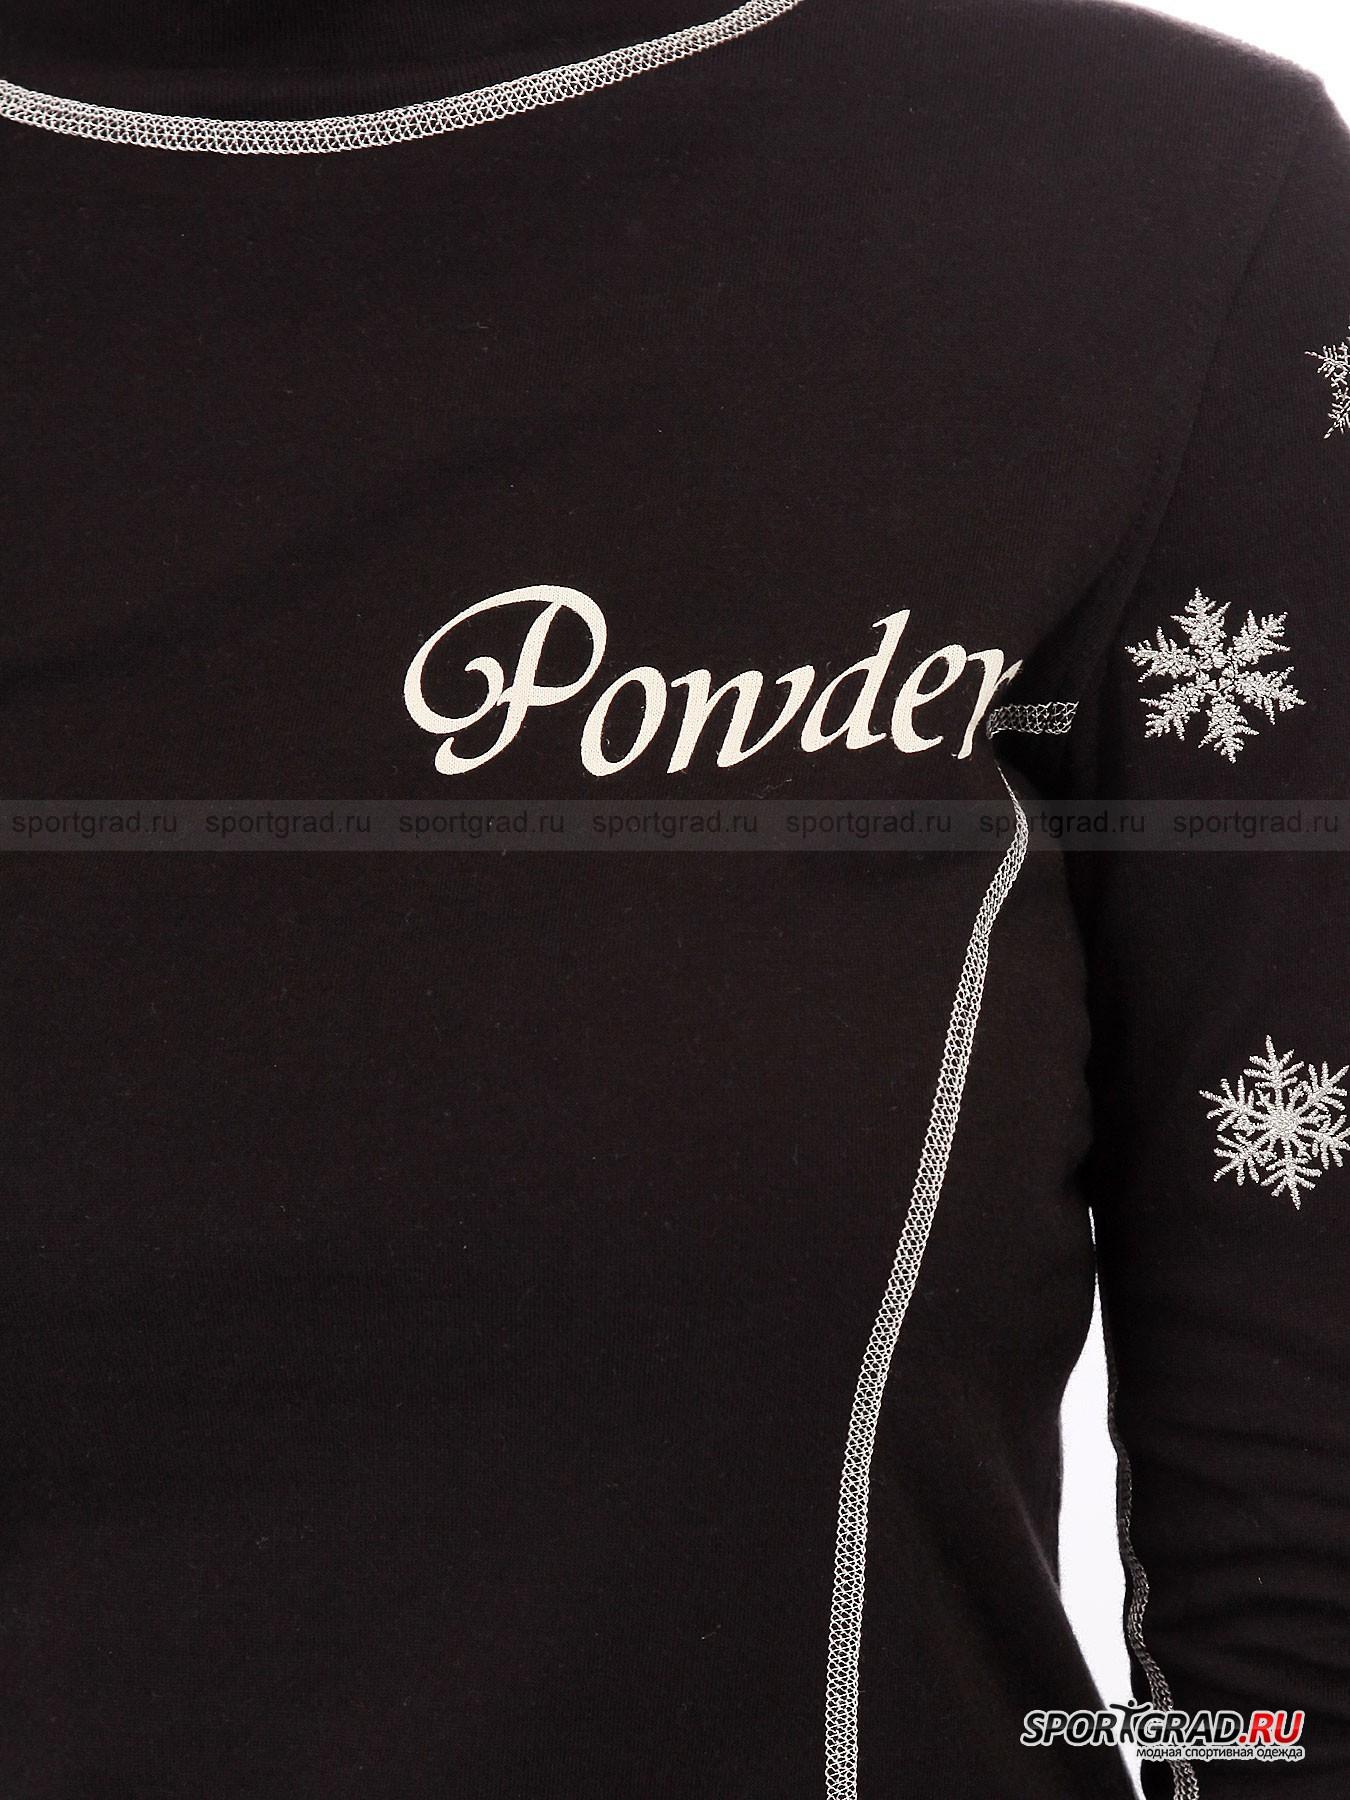 Водолазка женская Powder ALP-N-ROCK от Спортград